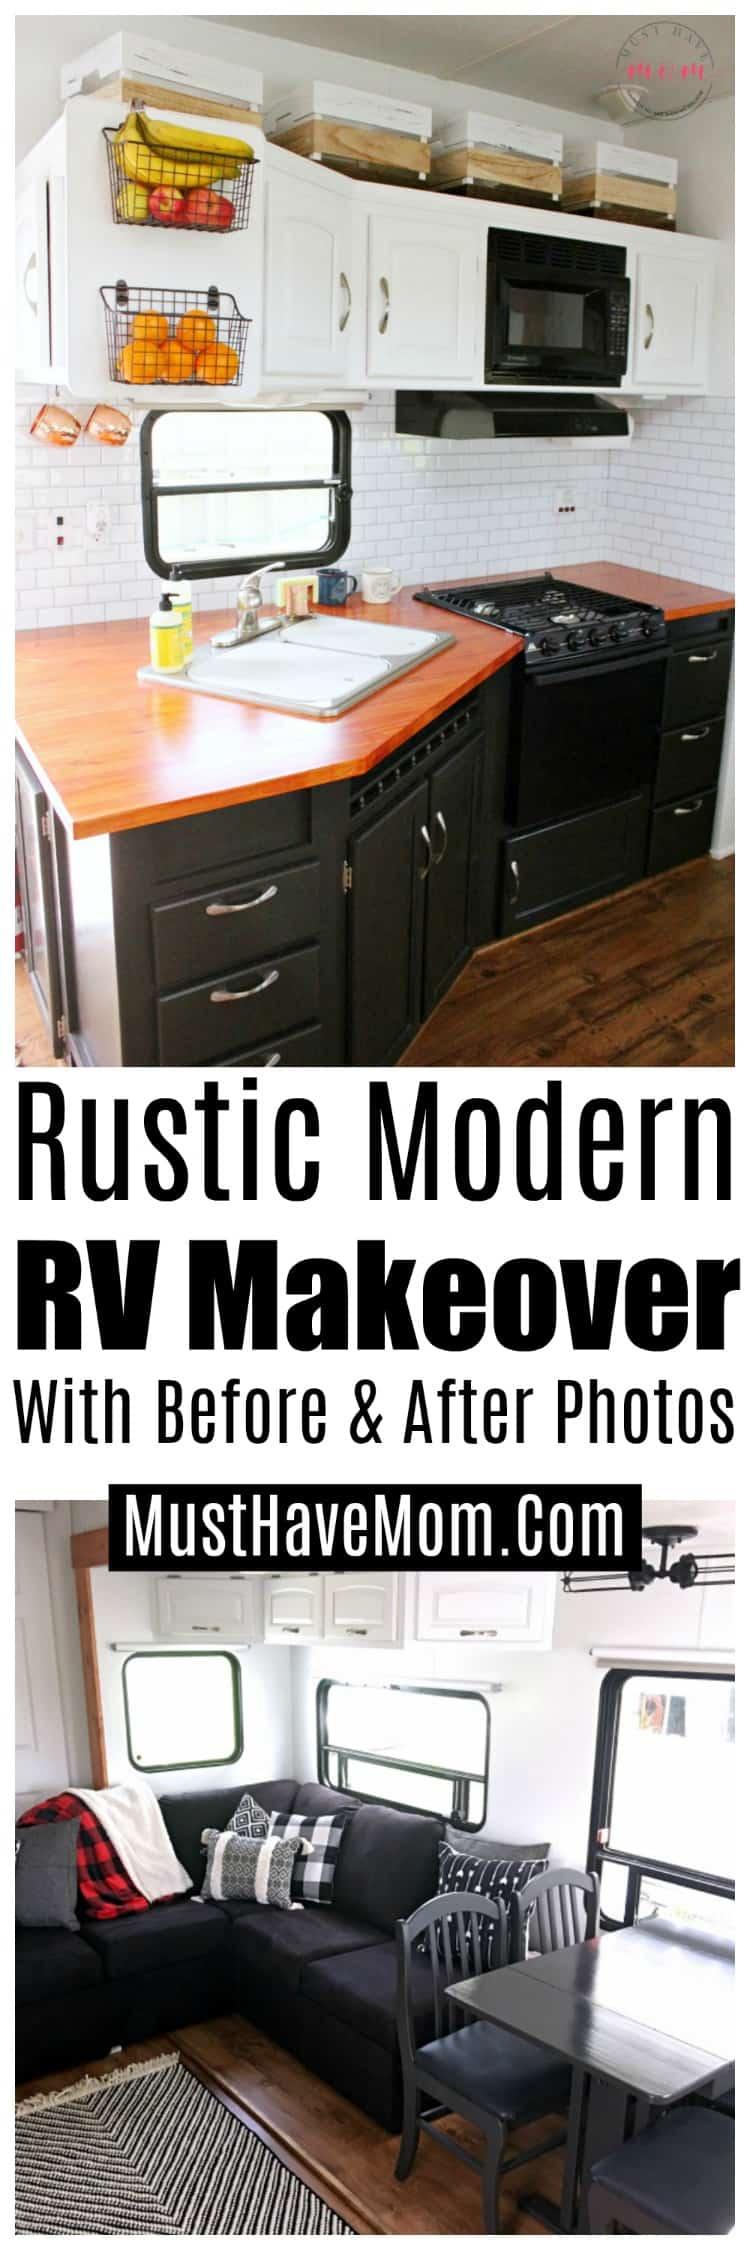 rustic modern rv makeover